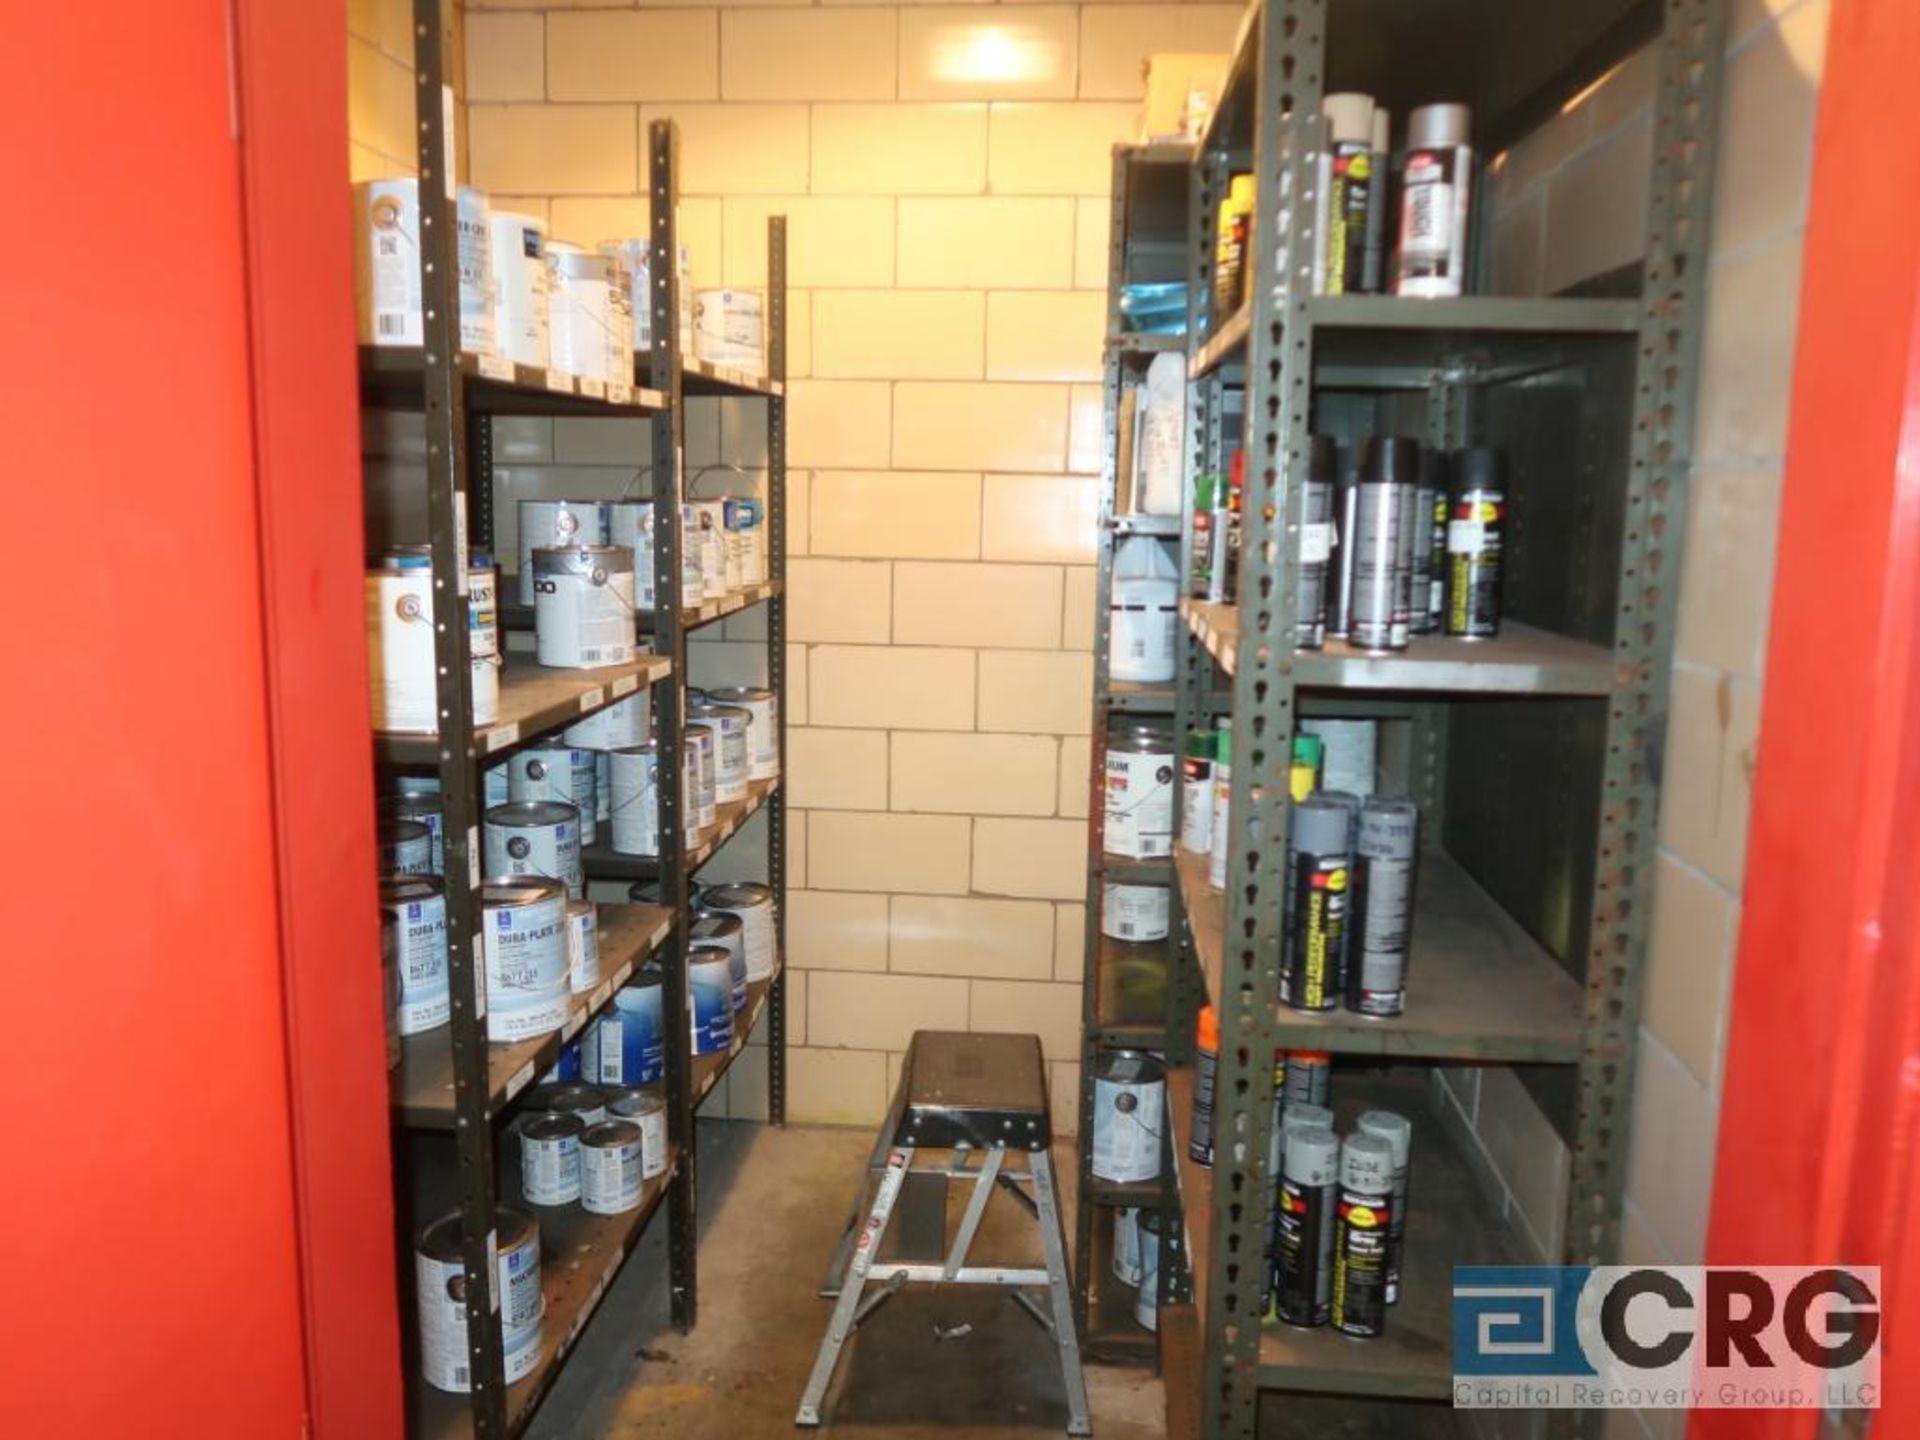 Lot of assorted paints (Store Basement)